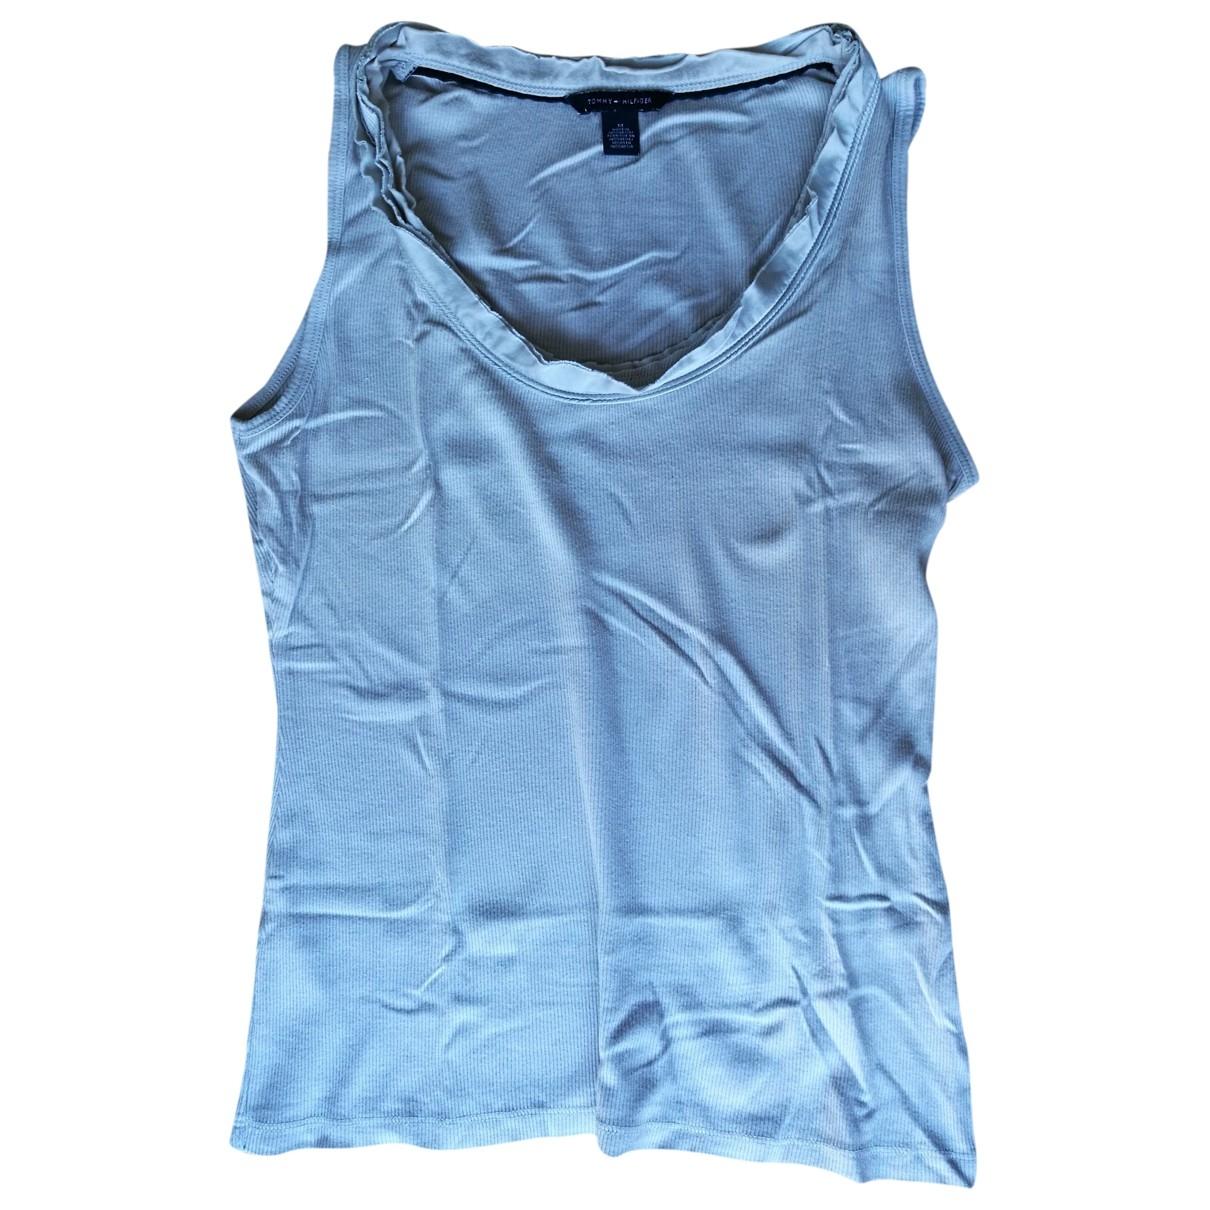 Tommy Hilfiger \N Grey Cotton  top for Women S International